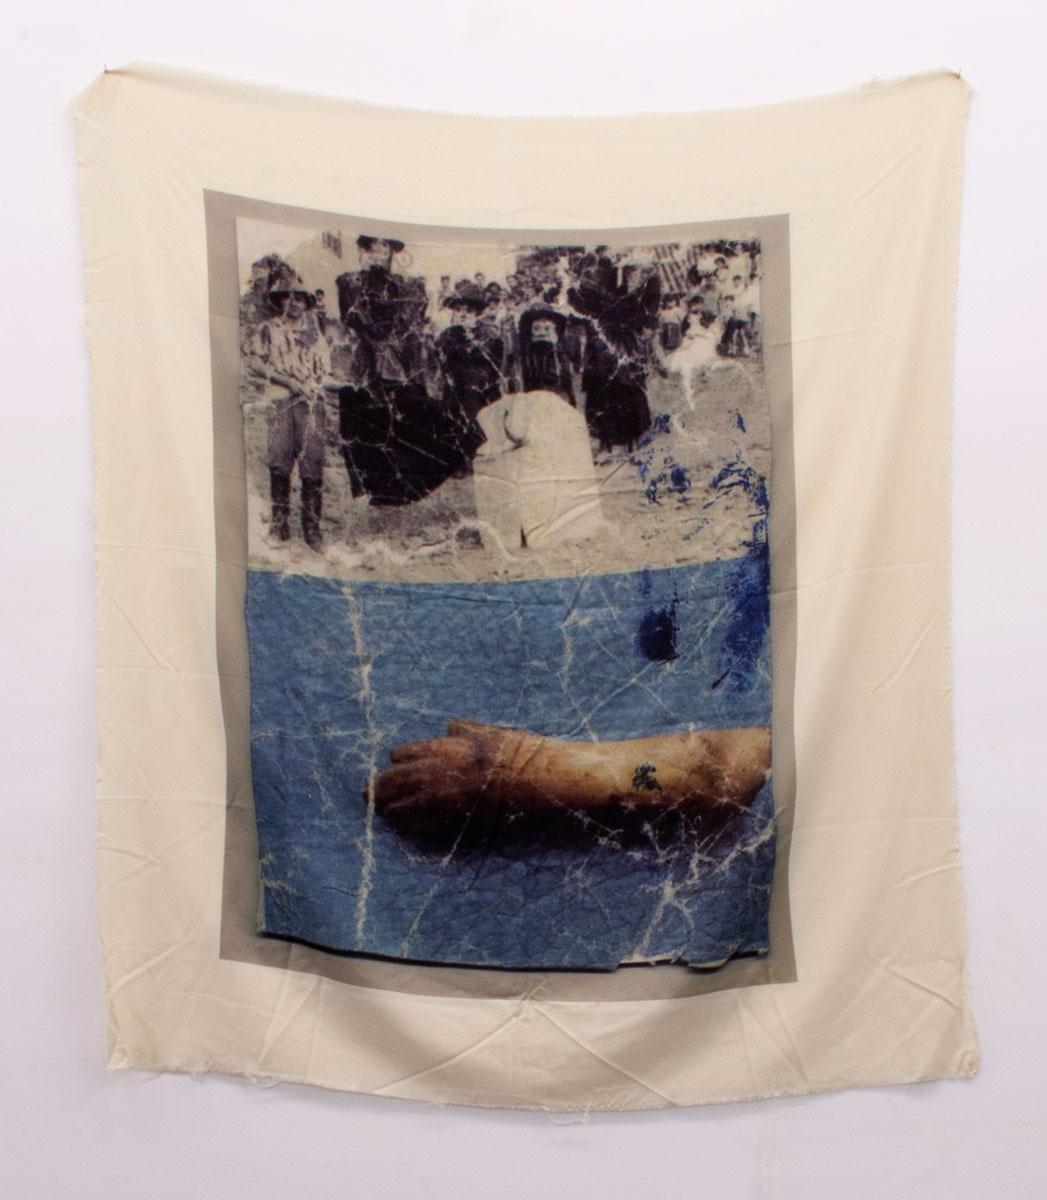 UNA IMPOSTURA (B), 2015. Impresión textil sobre twill de algodón inglés y madera de pino. 153 x 139 x 5 cm